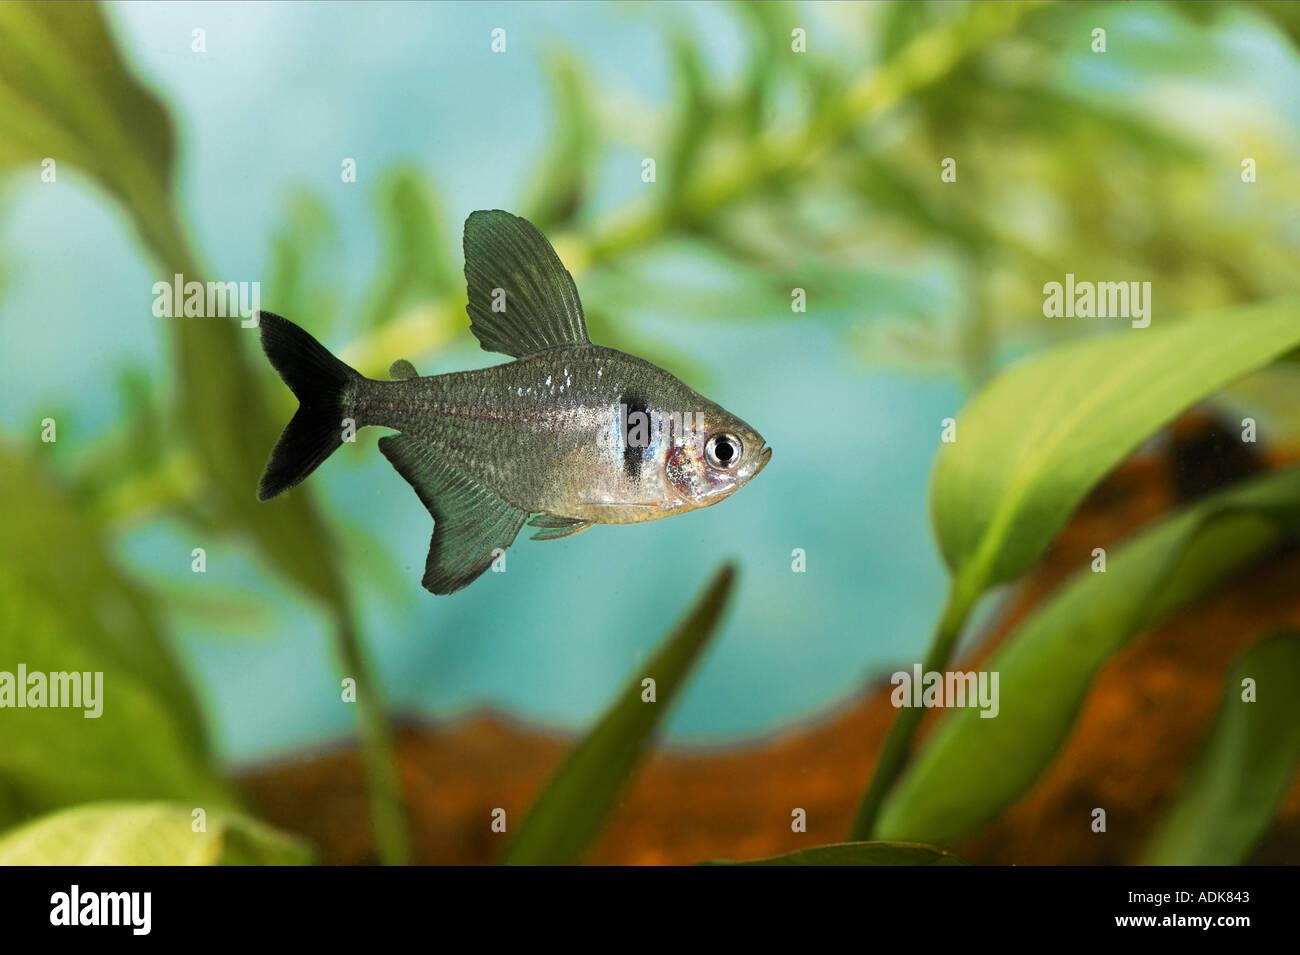 black phantom tetra / Hyphessobrycon megalopterus Stock Photo